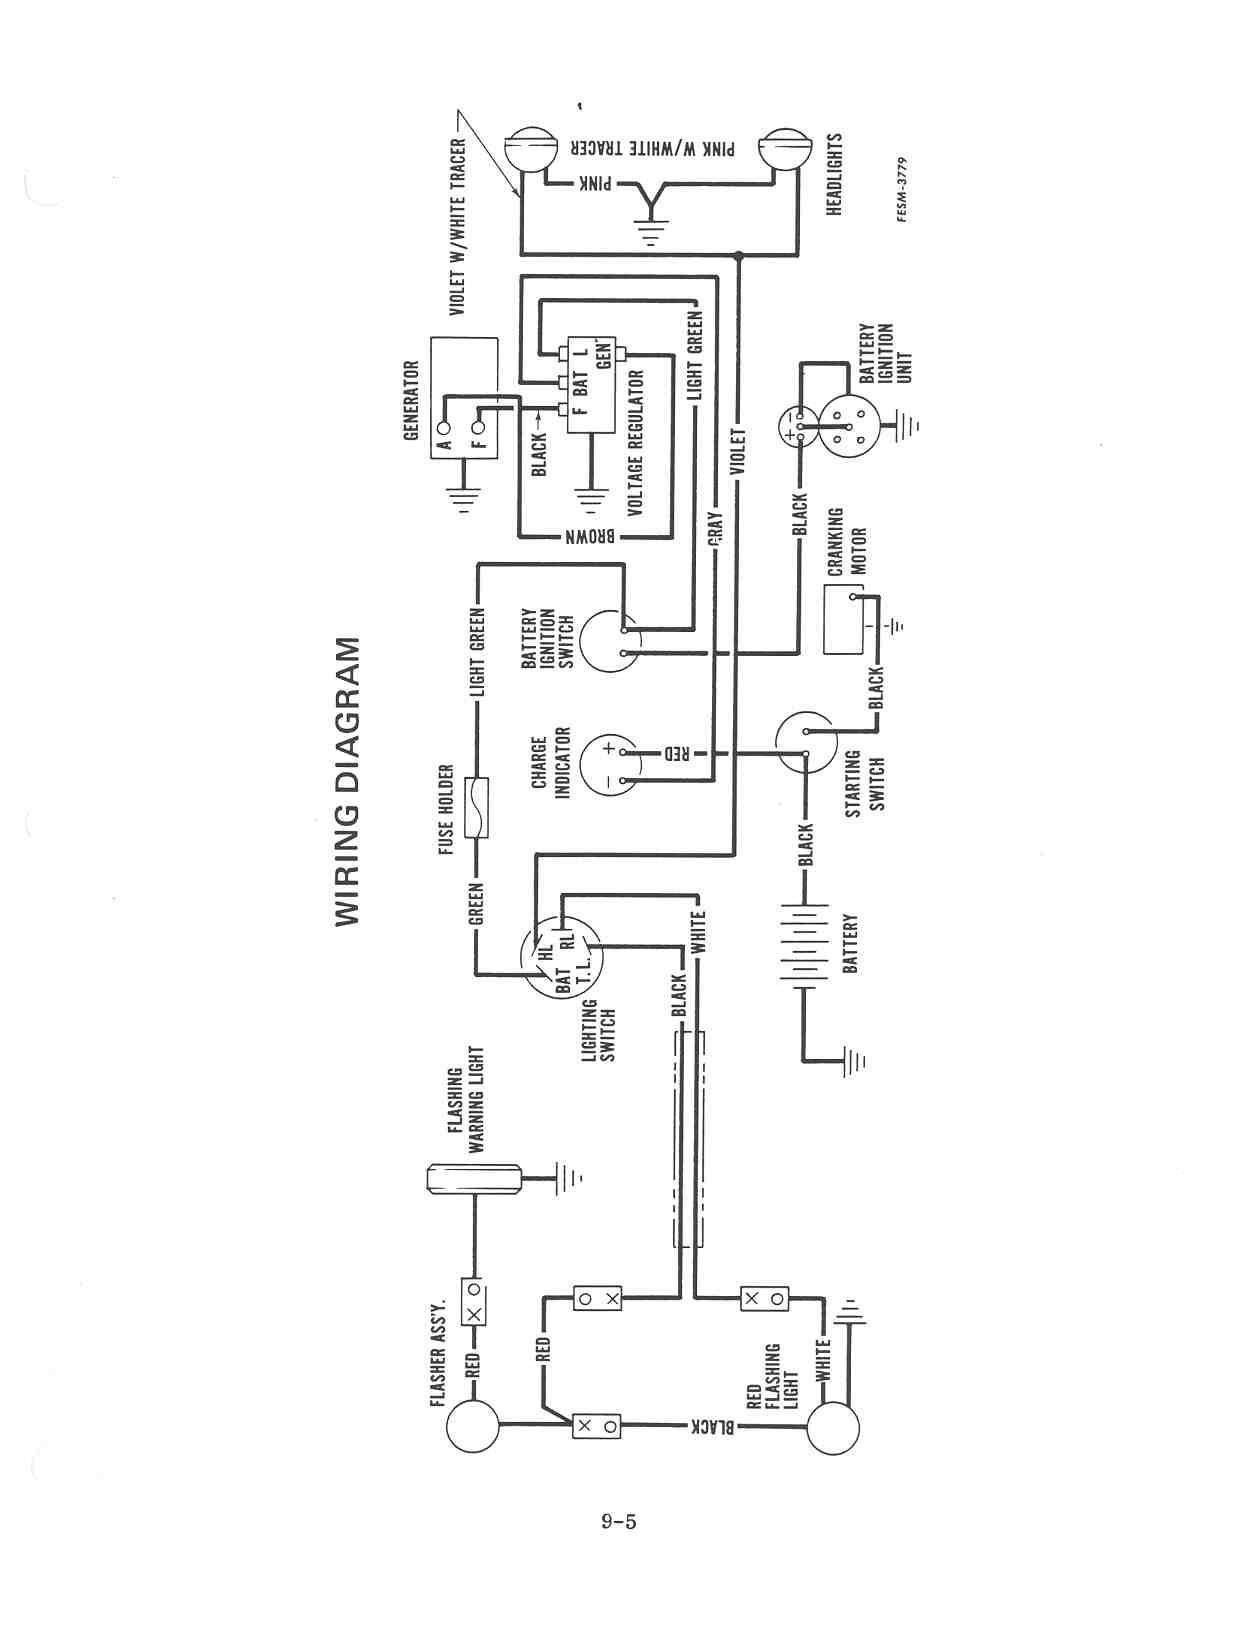 Farmall Super C Ignition Wiring Diagram Free Picture